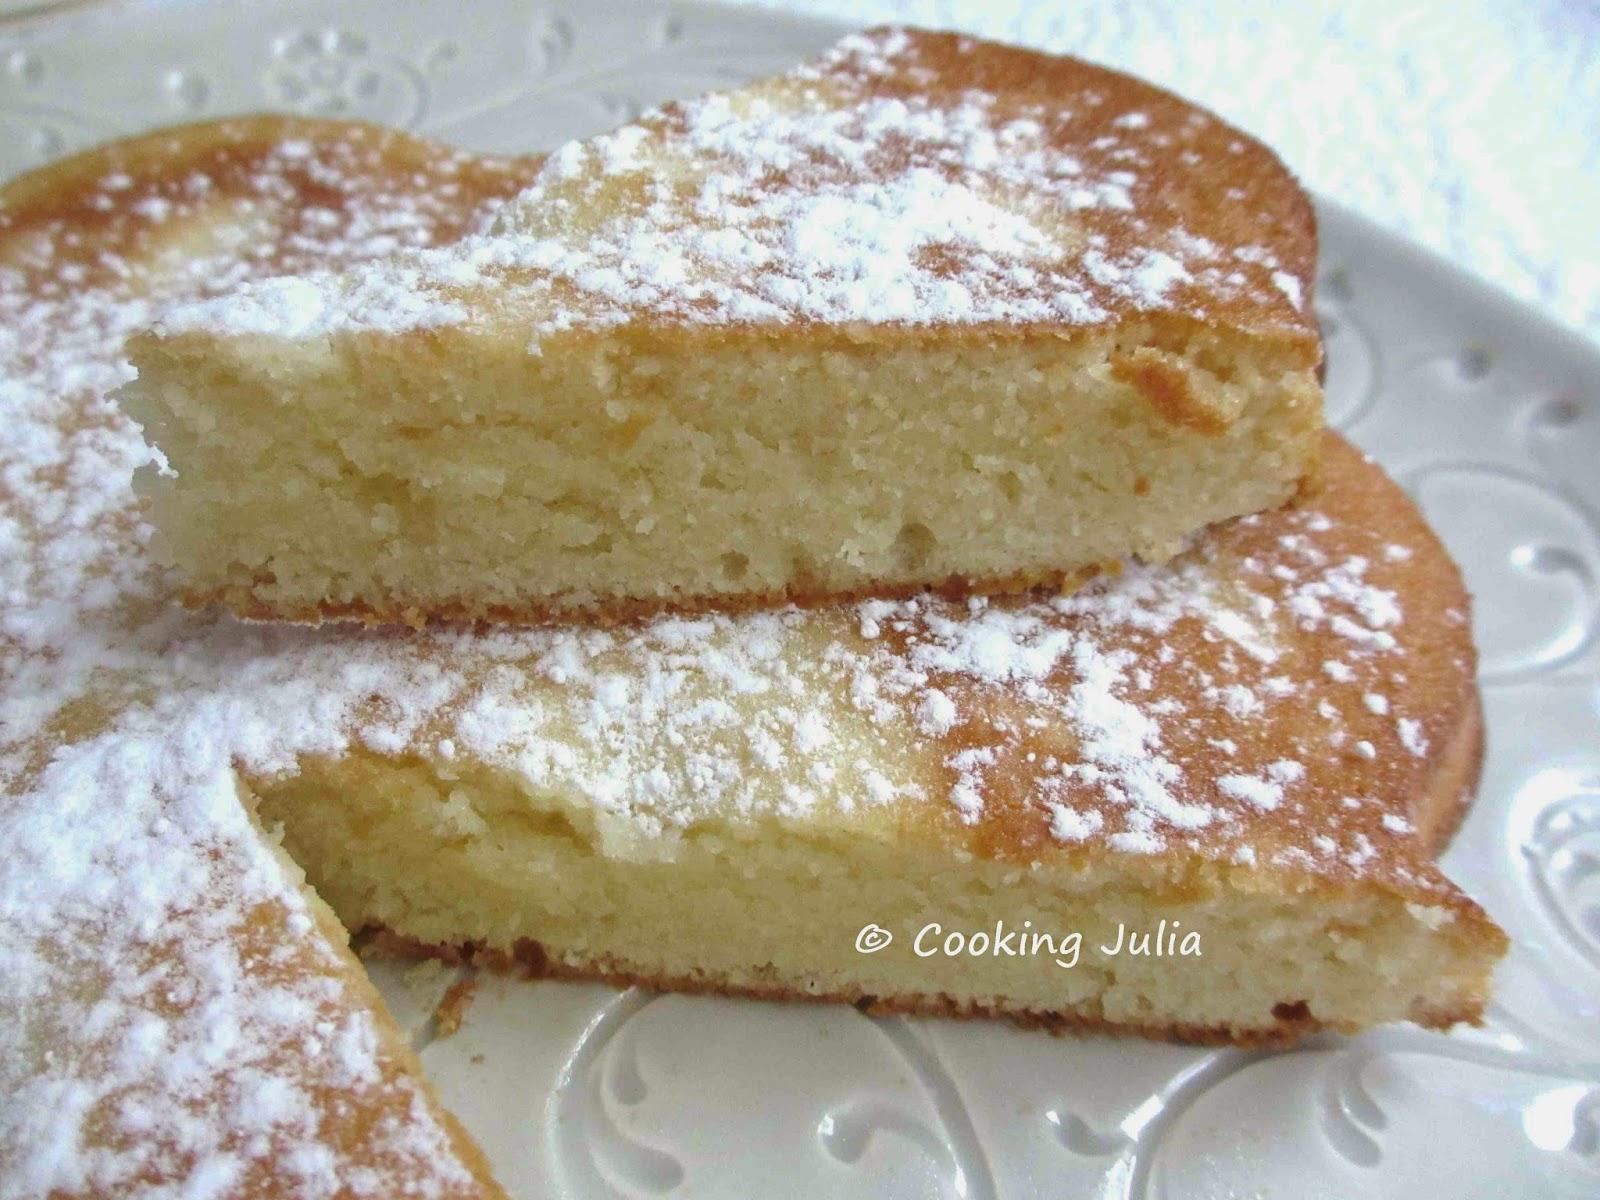 Cooking julia moelleux au chocolat blanc - Recette blanc d oeuf thermomix ...